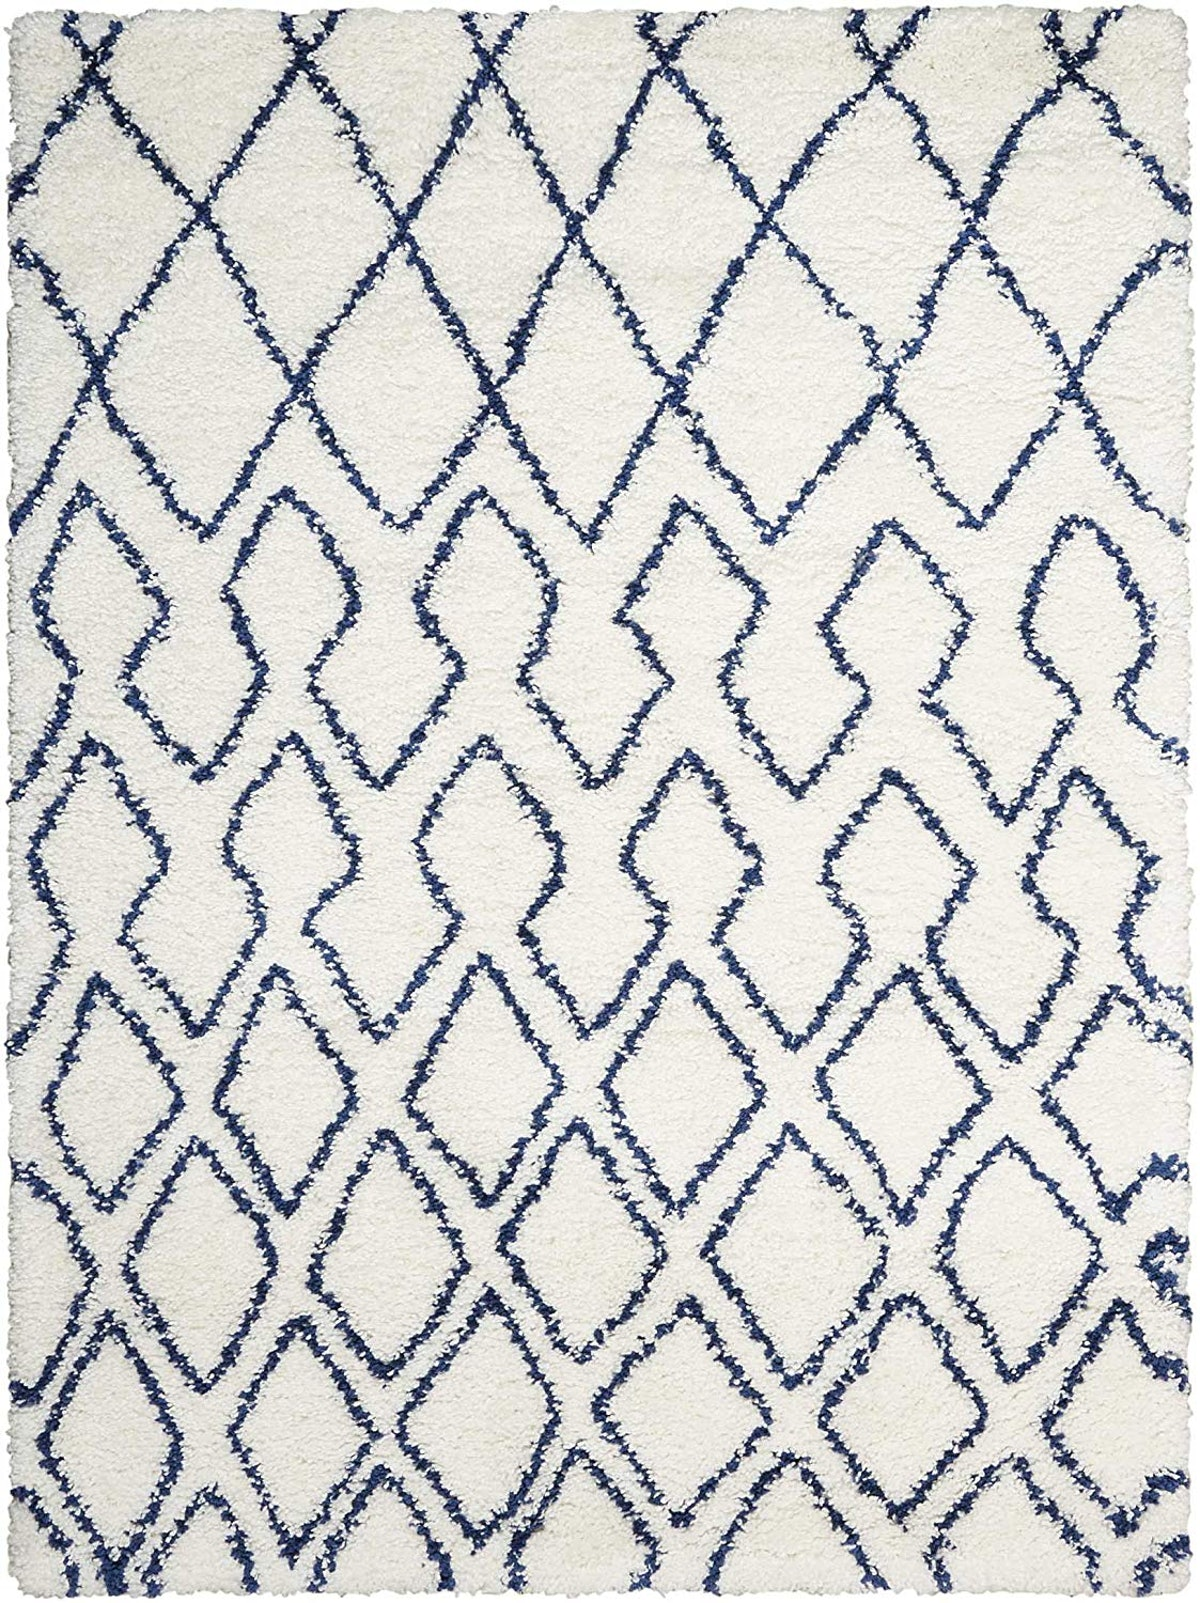 Calvin Klein Riad Ivory/Navy Shag Area Rug